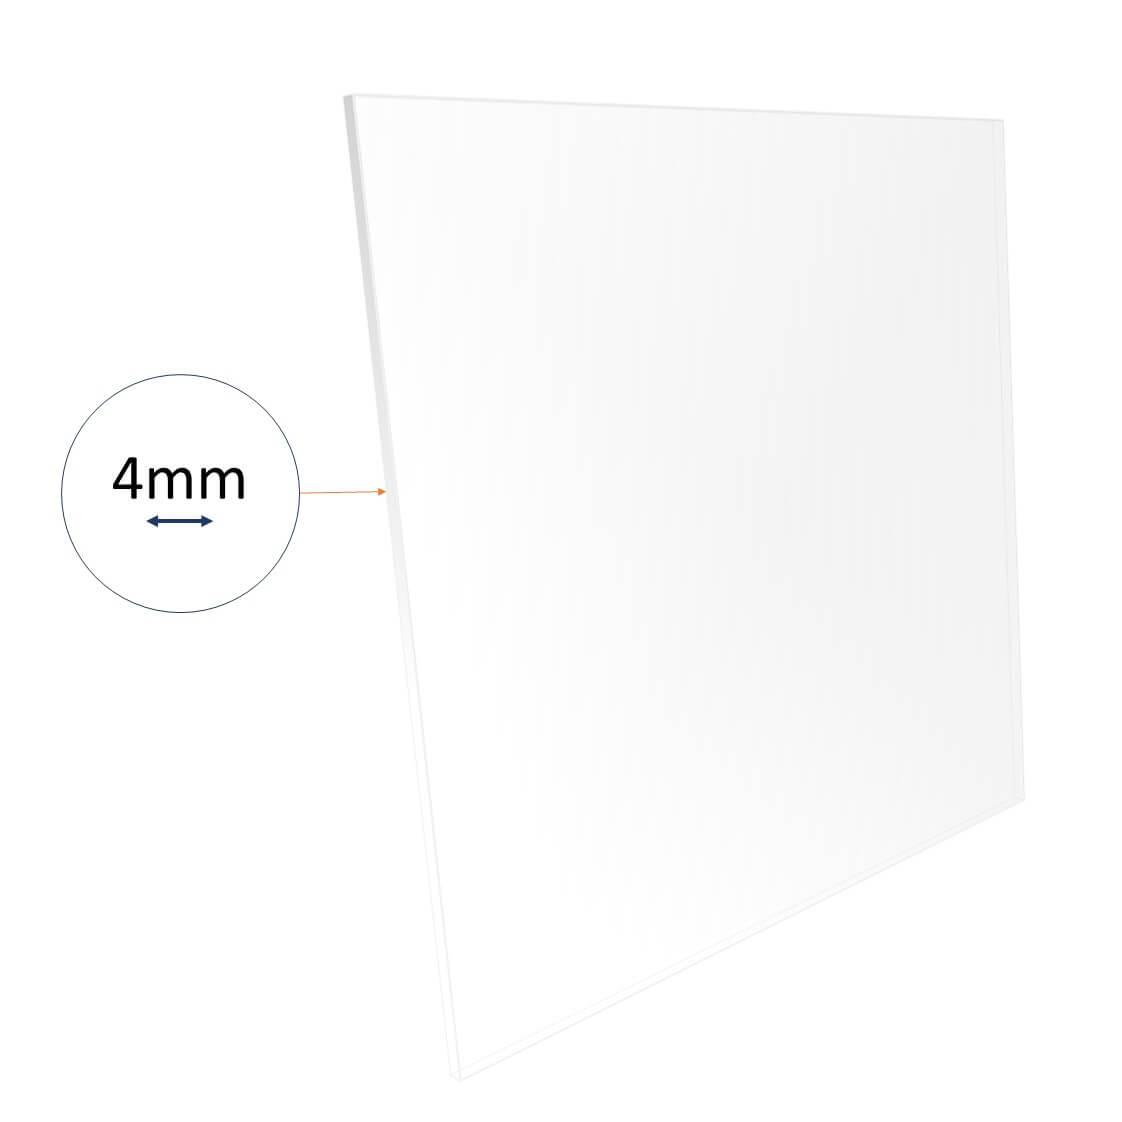 4mm acrylic sheet cut to size